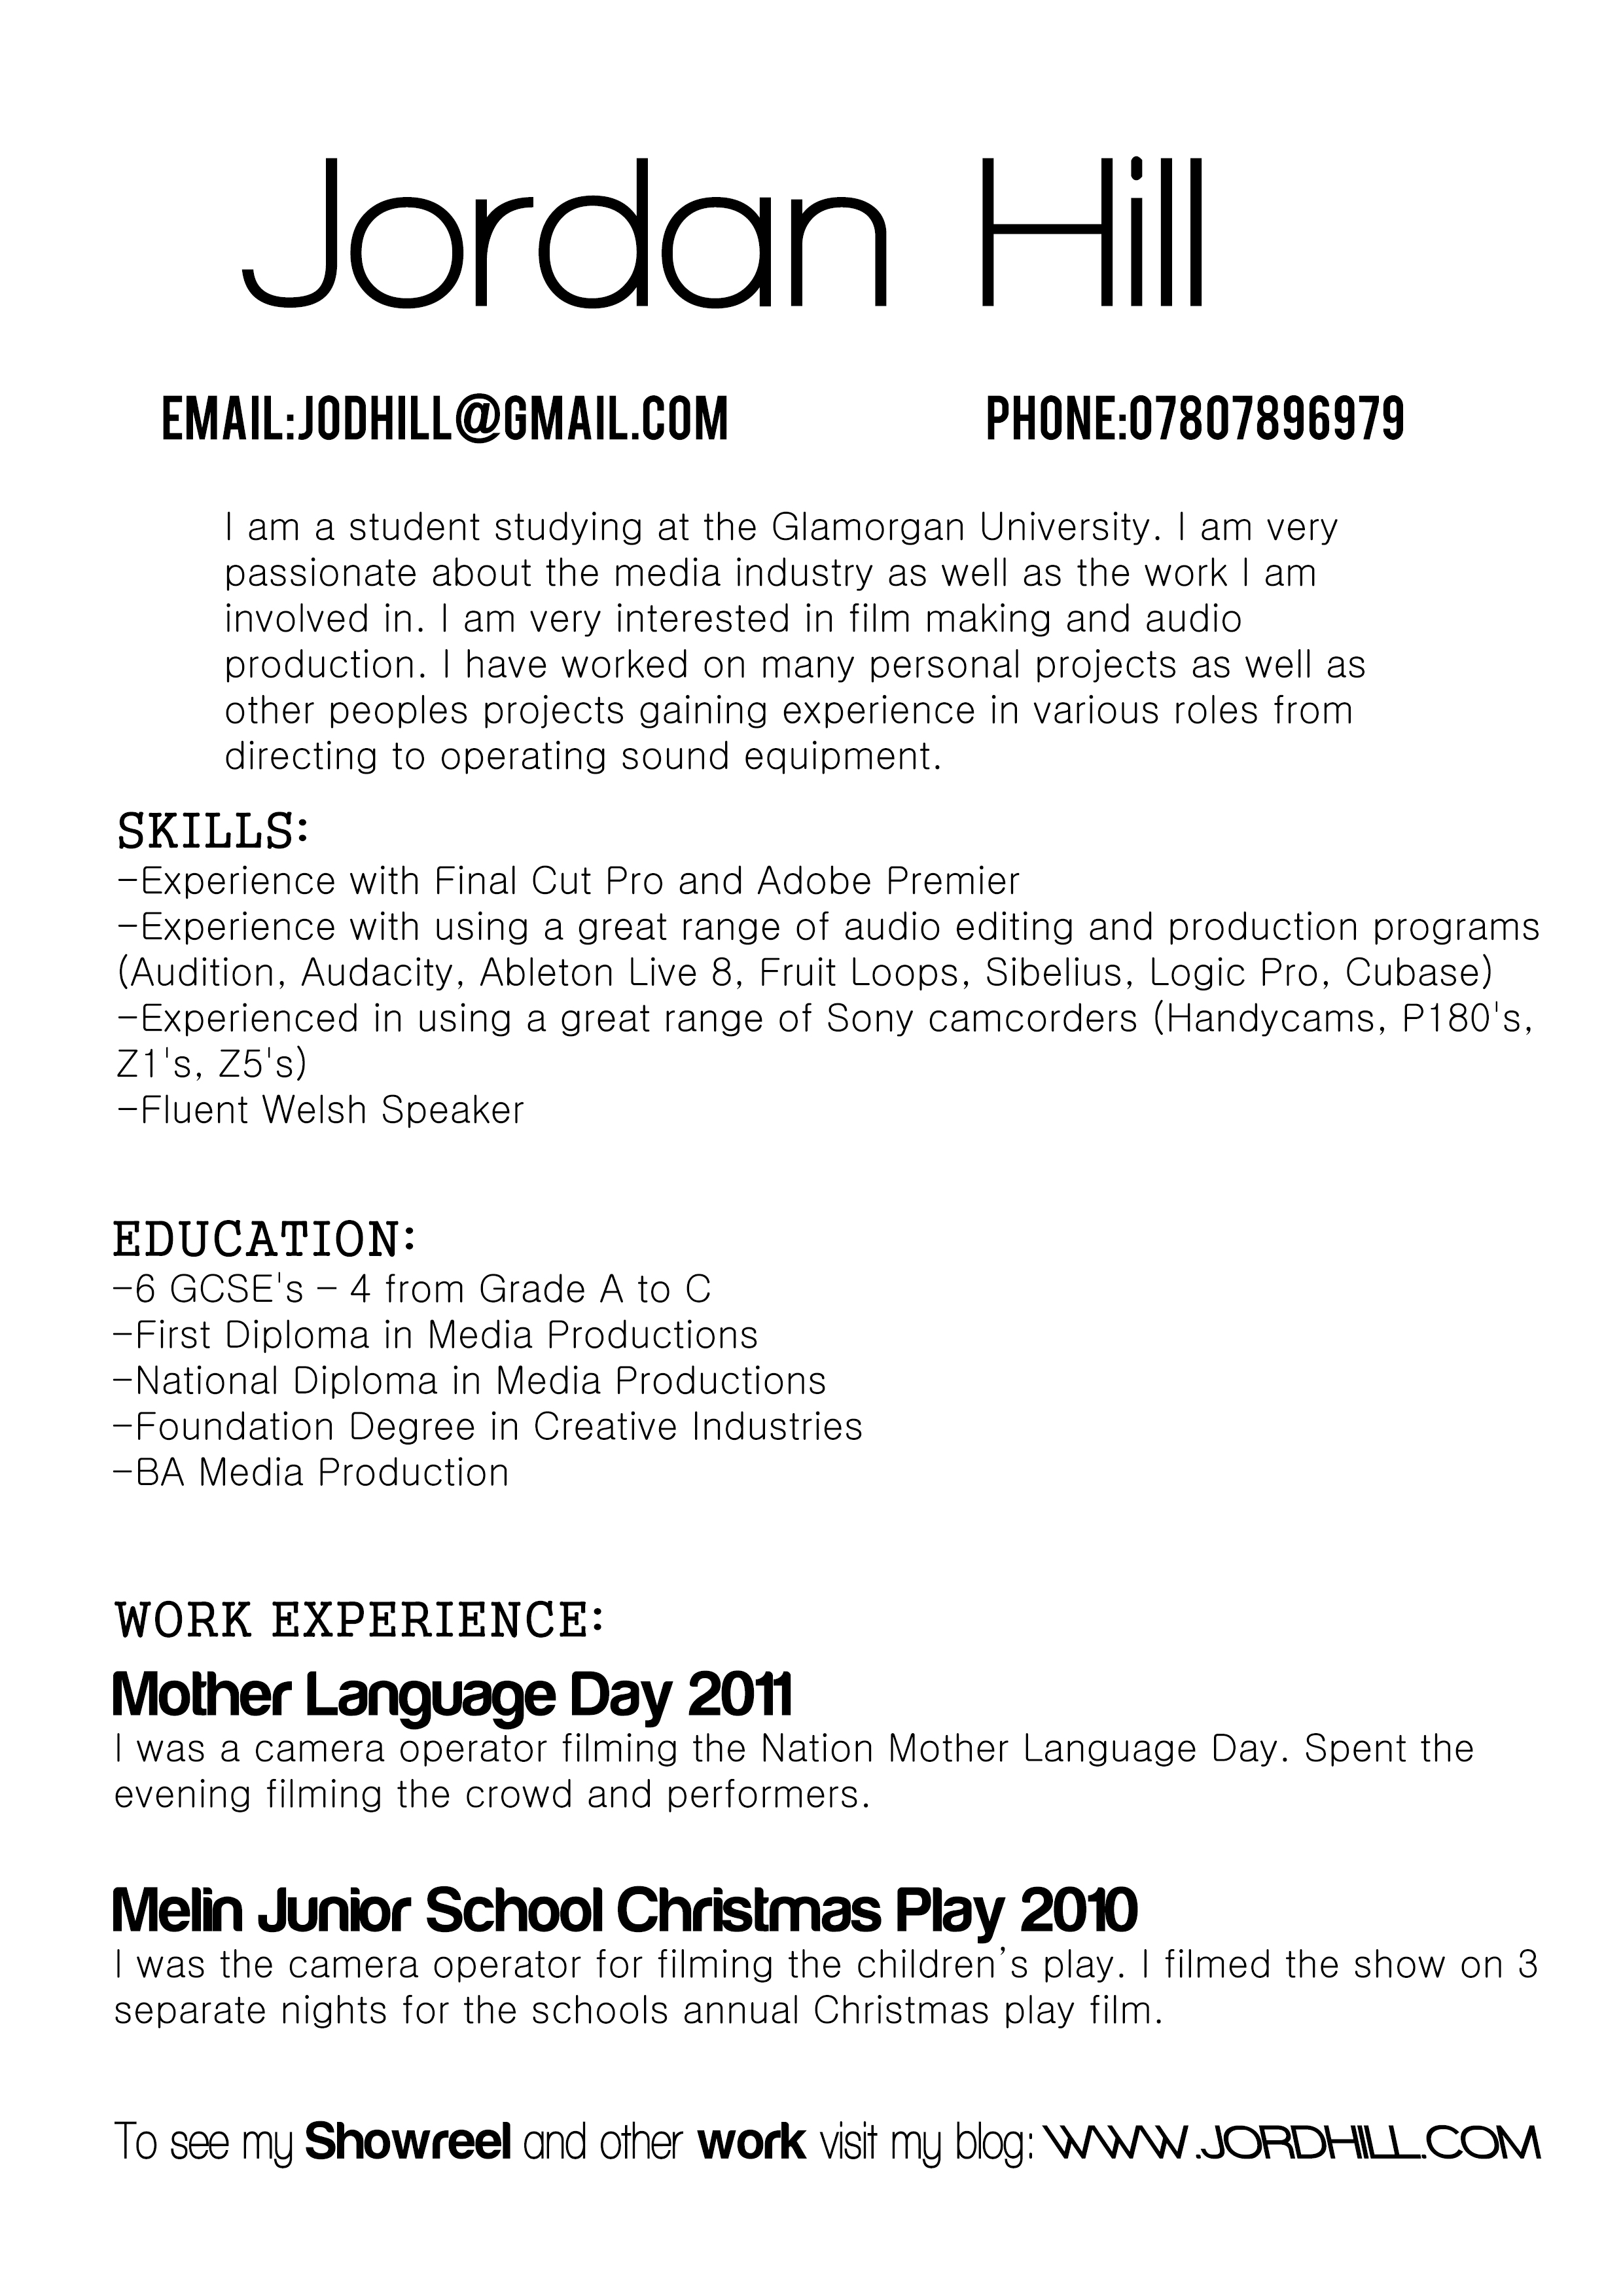 CV THE WORK OF JORDAN HILL